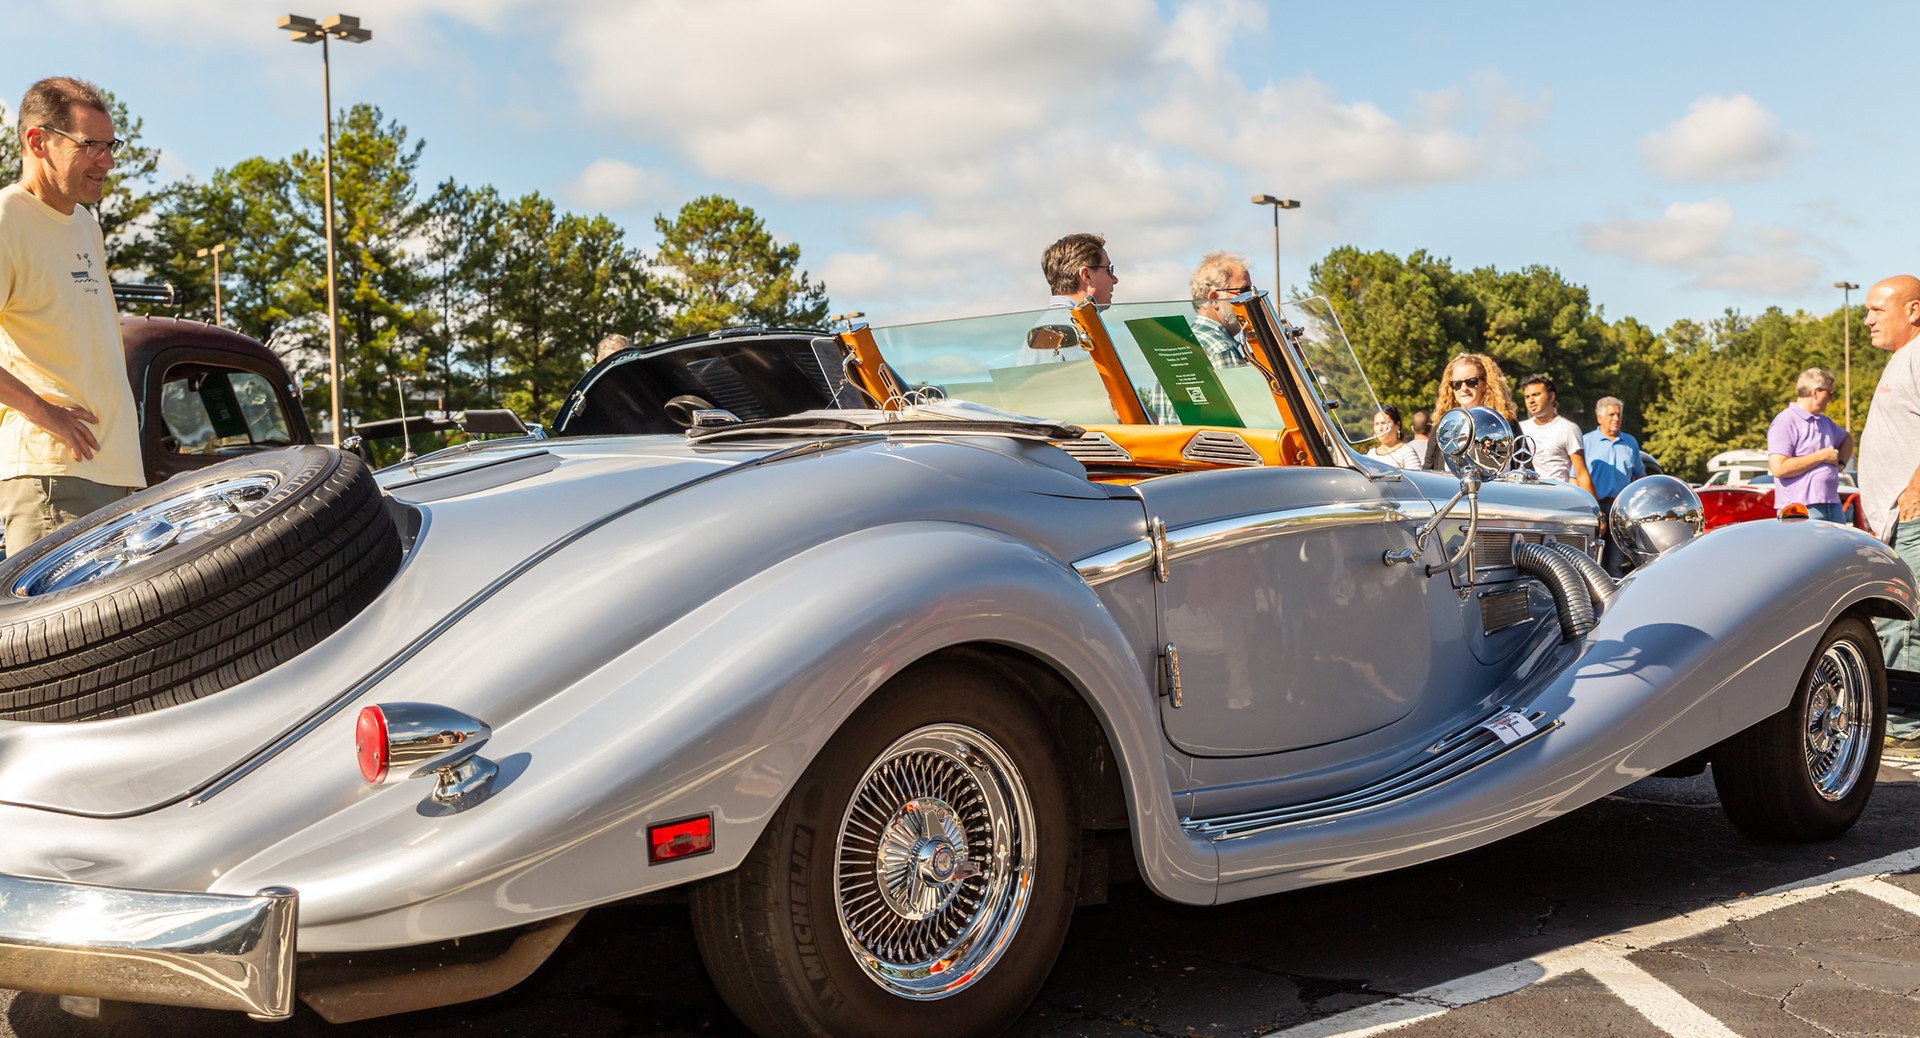 BH Art Fest Car Show 19 (38 of 109).jpg